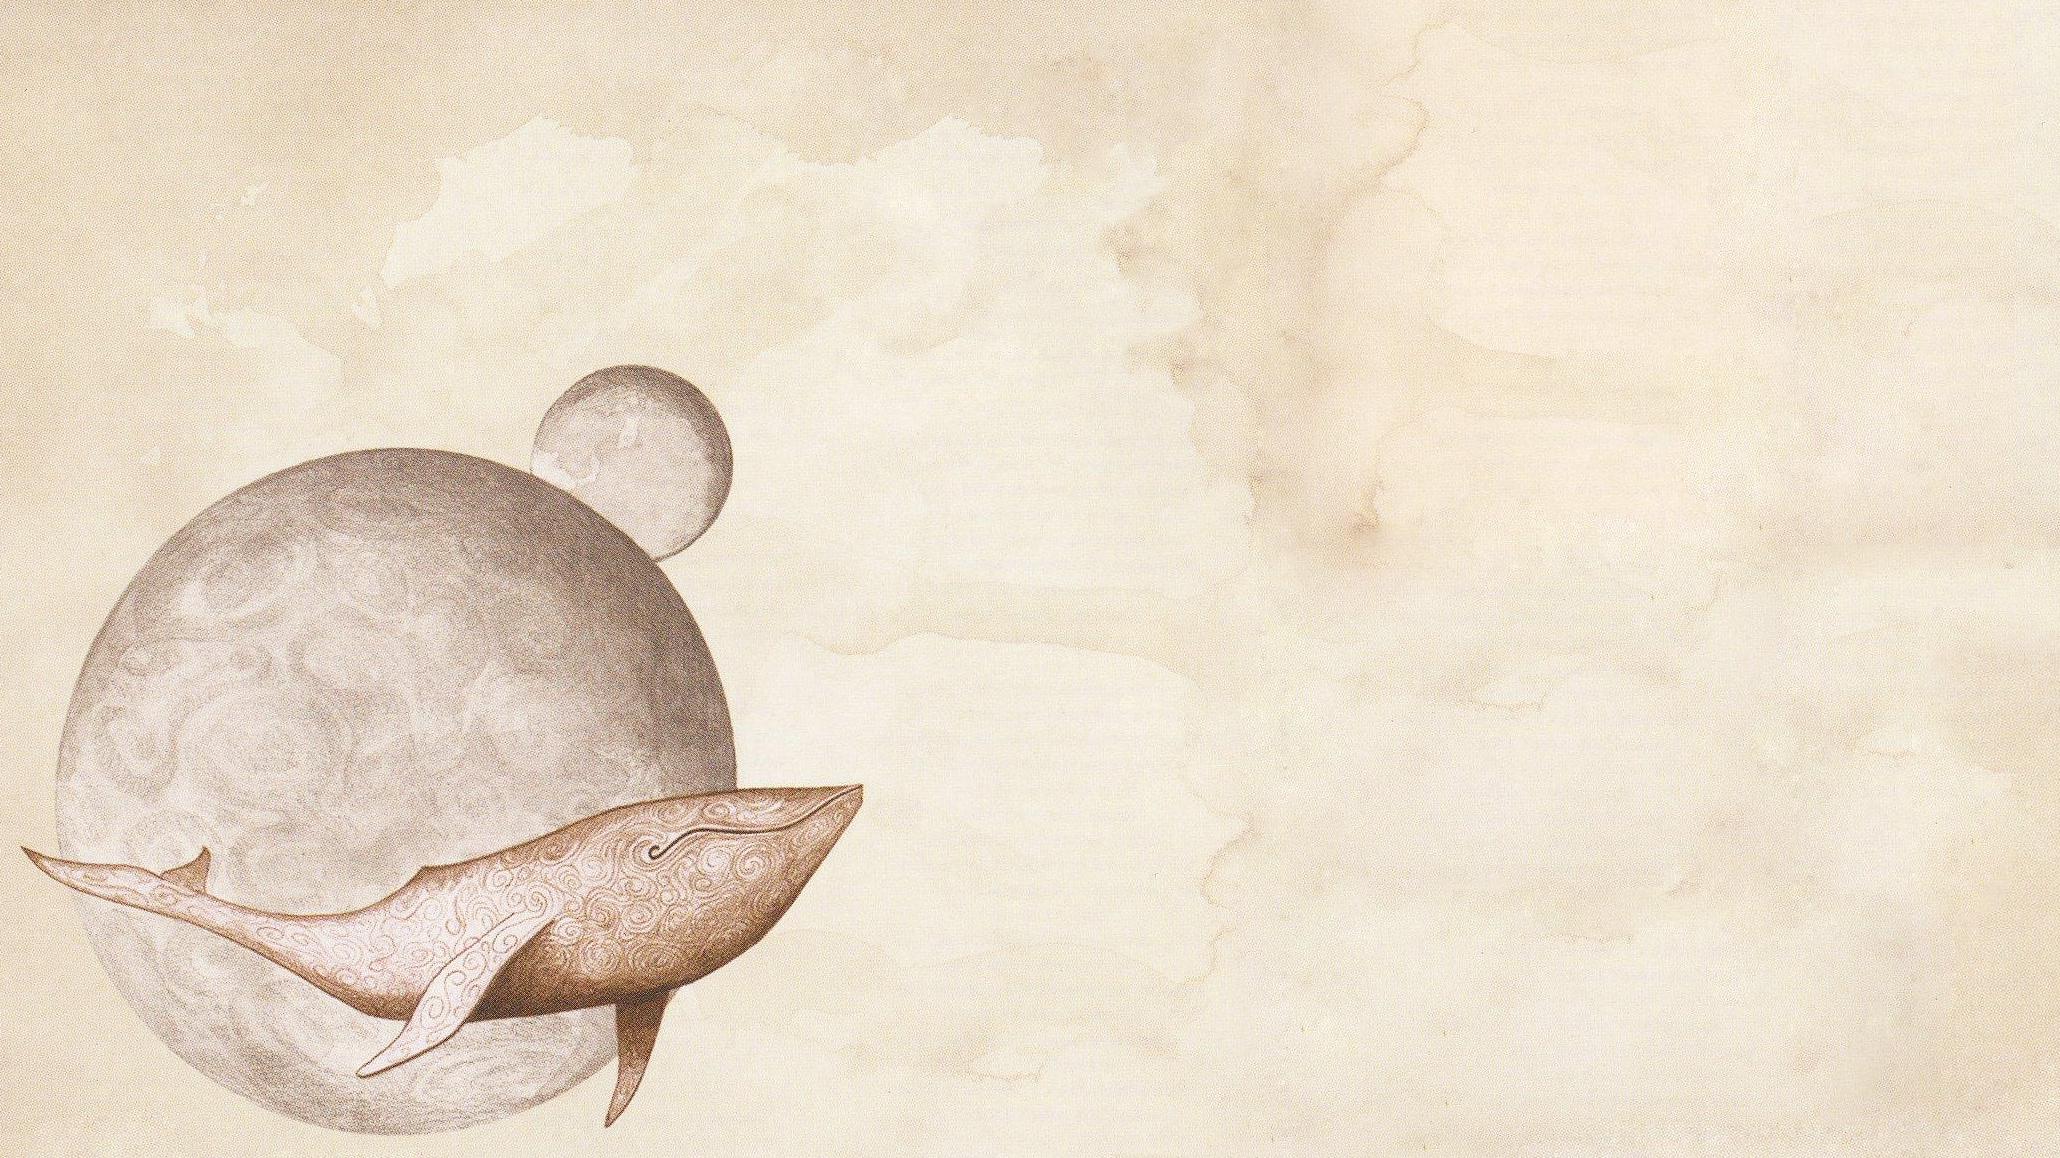 digital Art Universe Space Planet Minimalism Whale 2060x1158